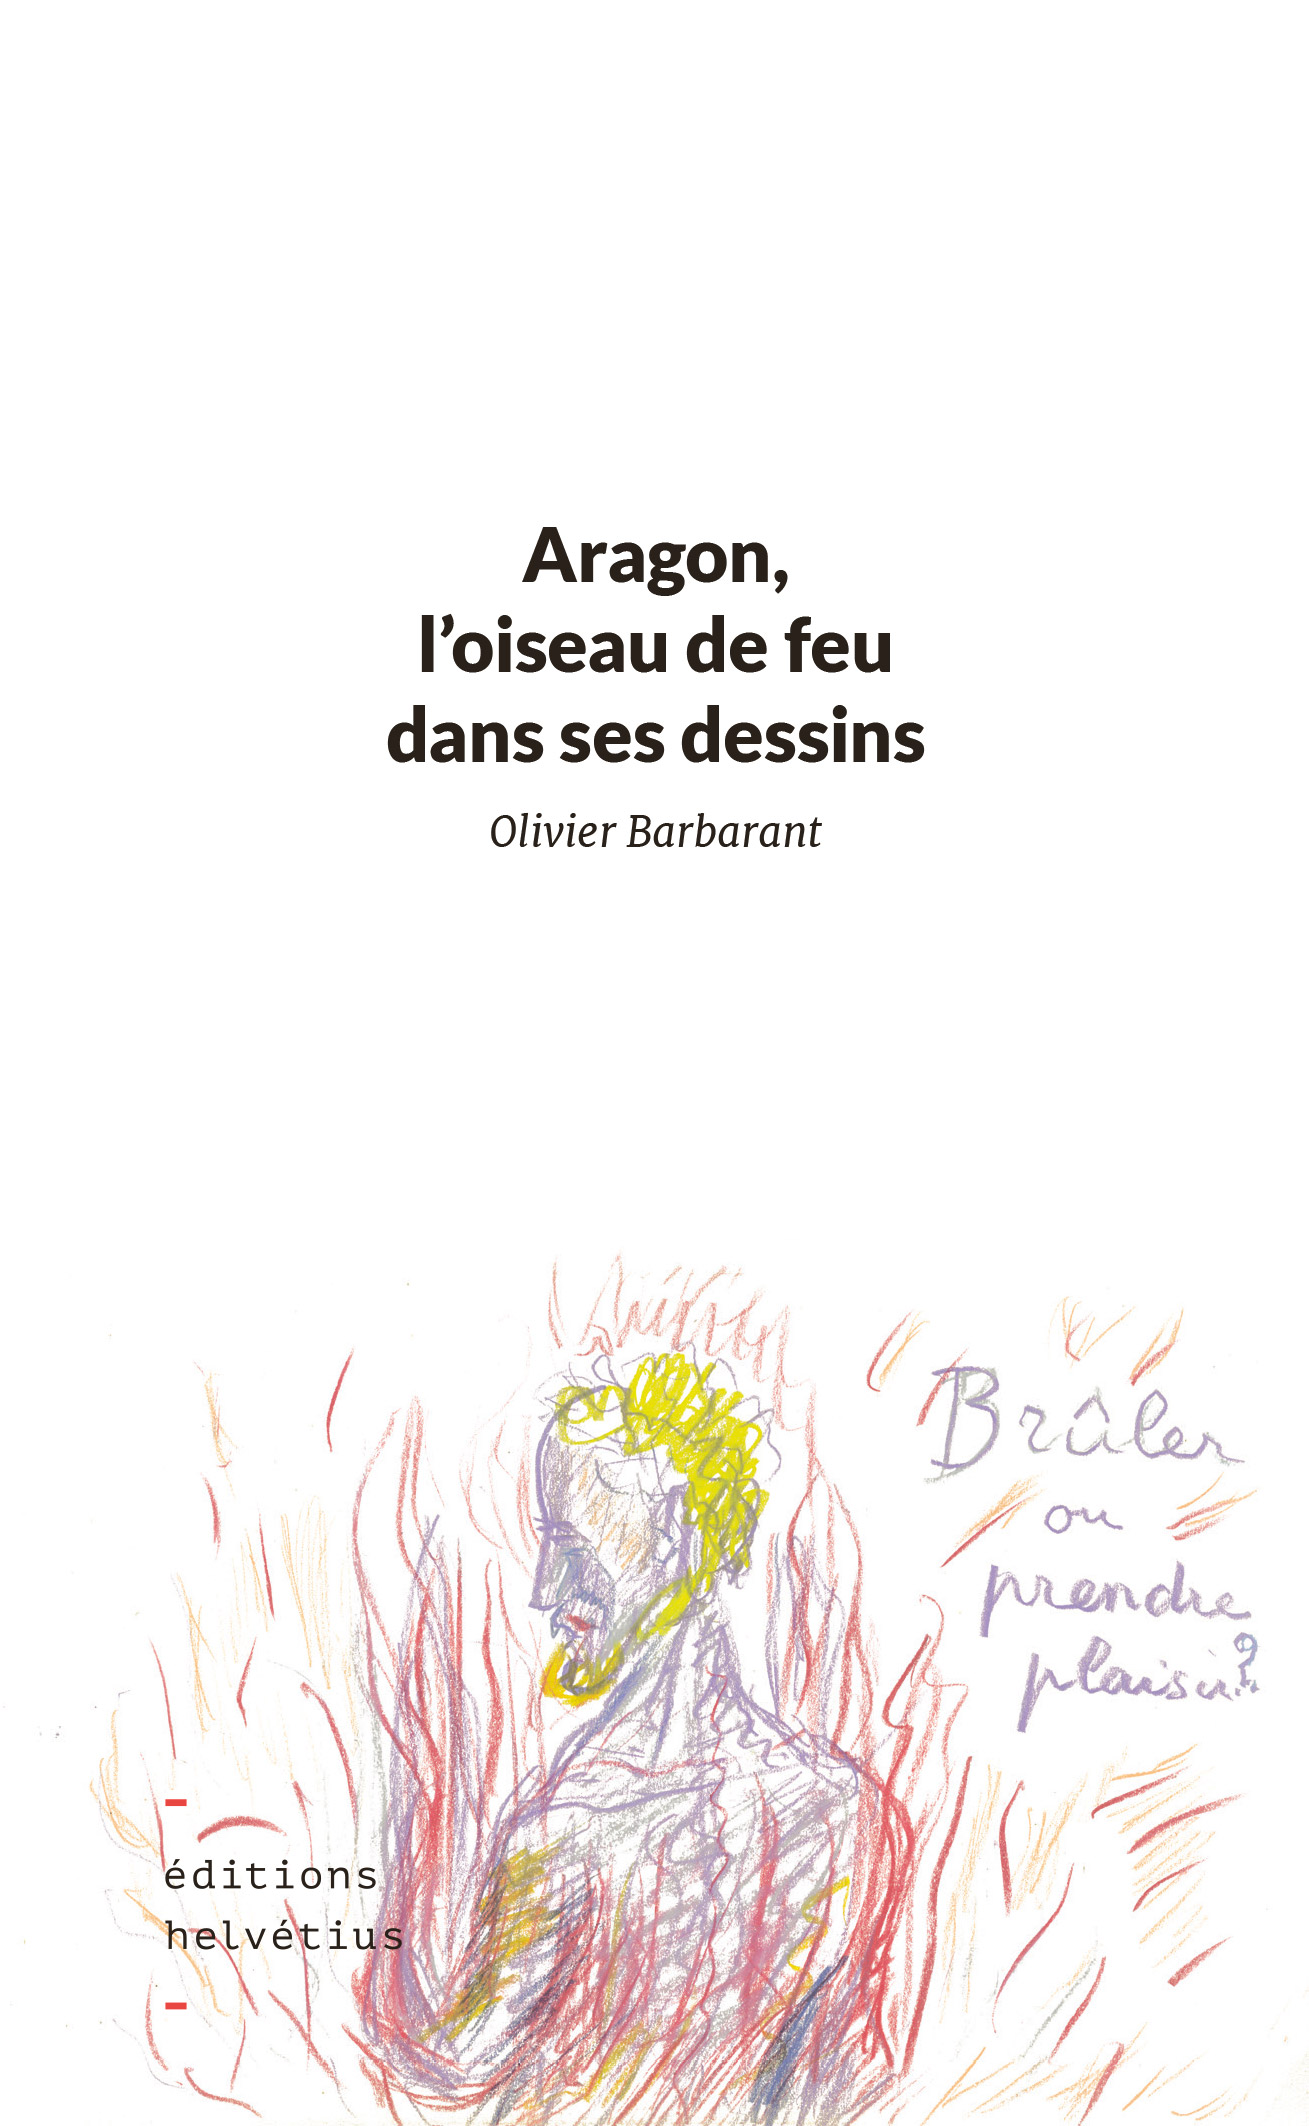 Aragon L Oiseau De Feu Dans Ses Dessins Editions Helvetius